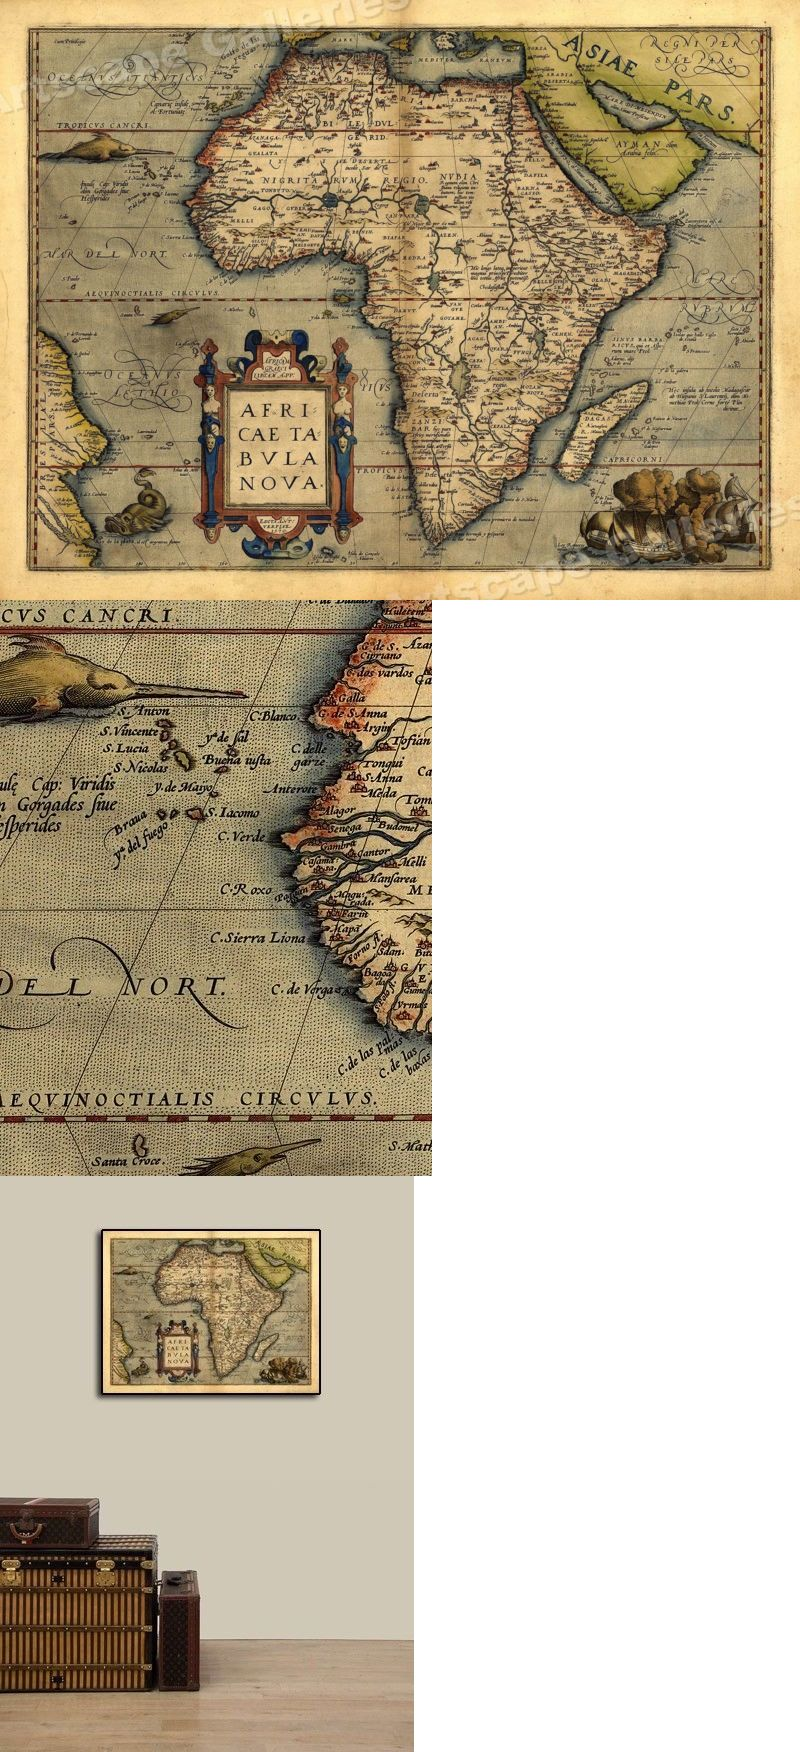 Details About 1570 Orbis Terrarum Africa Historic Vintage Map 18x24 New World Map World Map Vintage World Maps